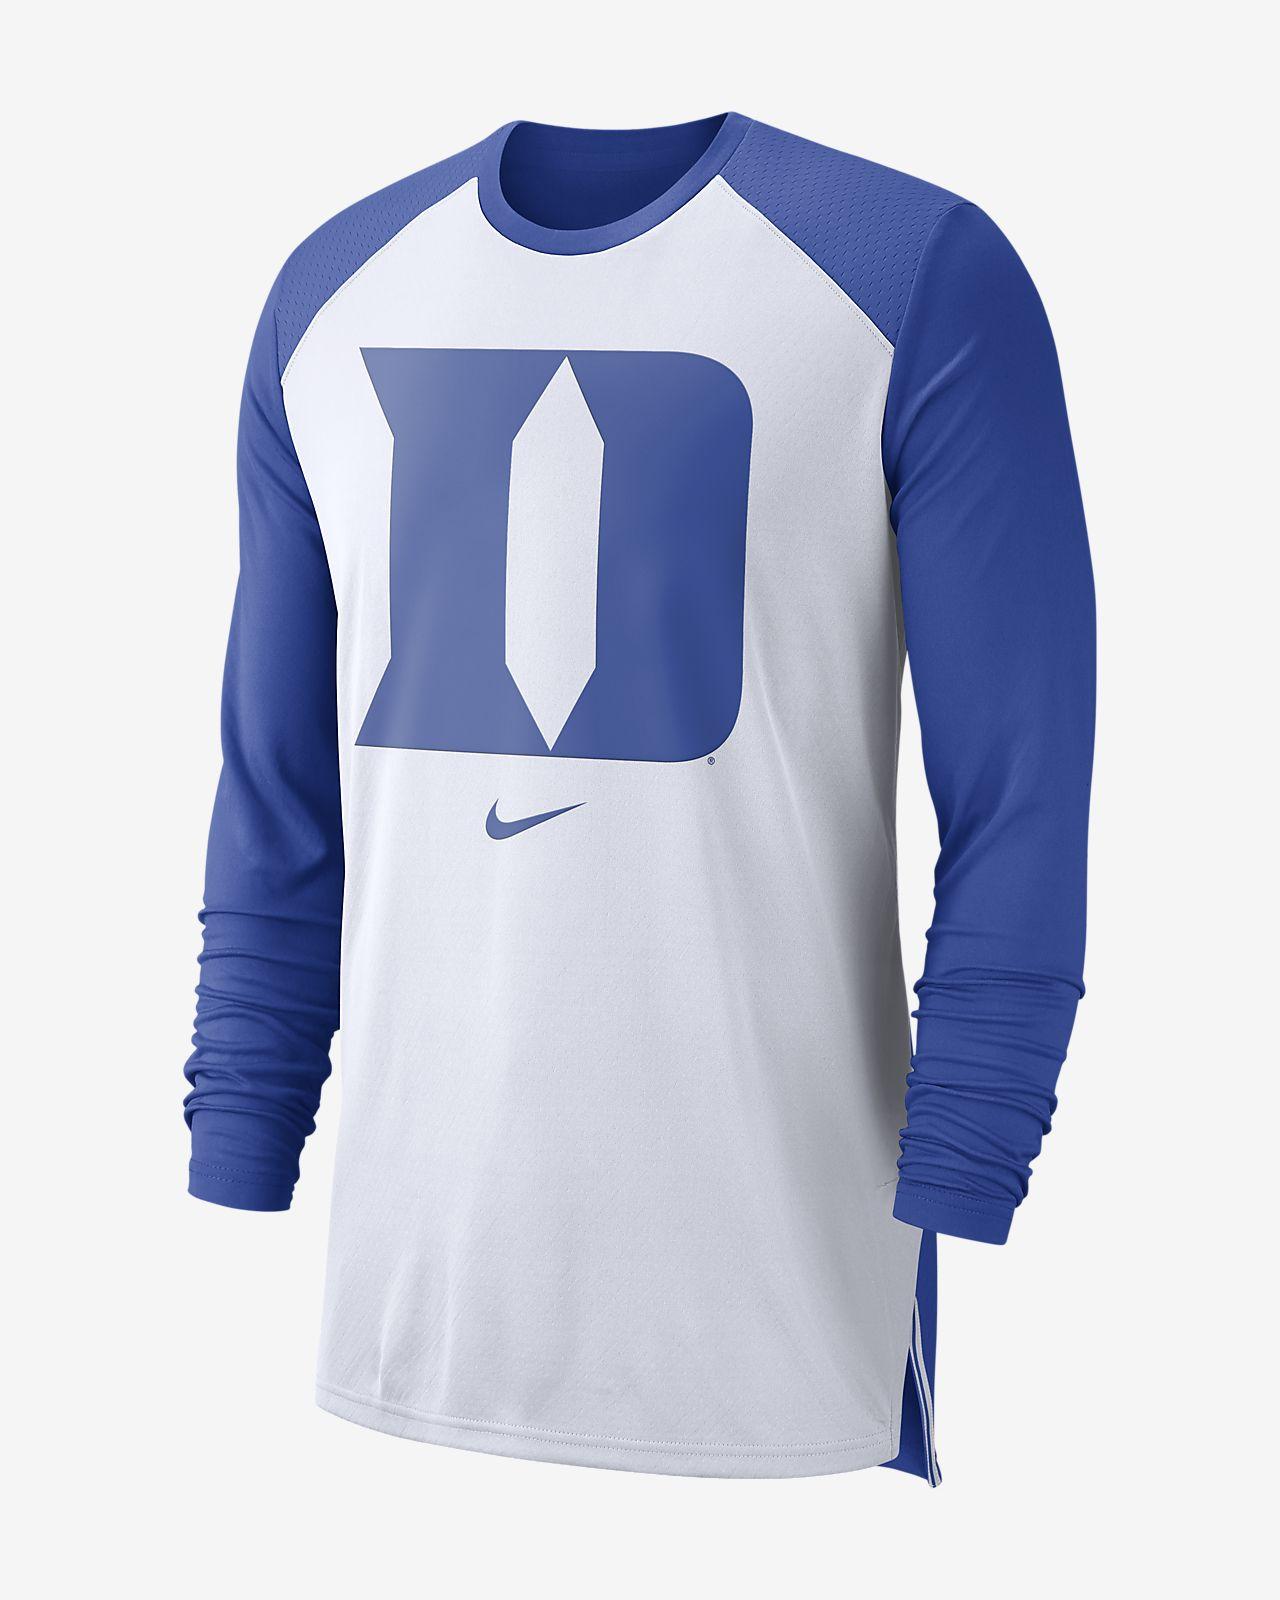 Nike College Dri Fit Duke Mens Long Sleeve Basketball Top Nikecom